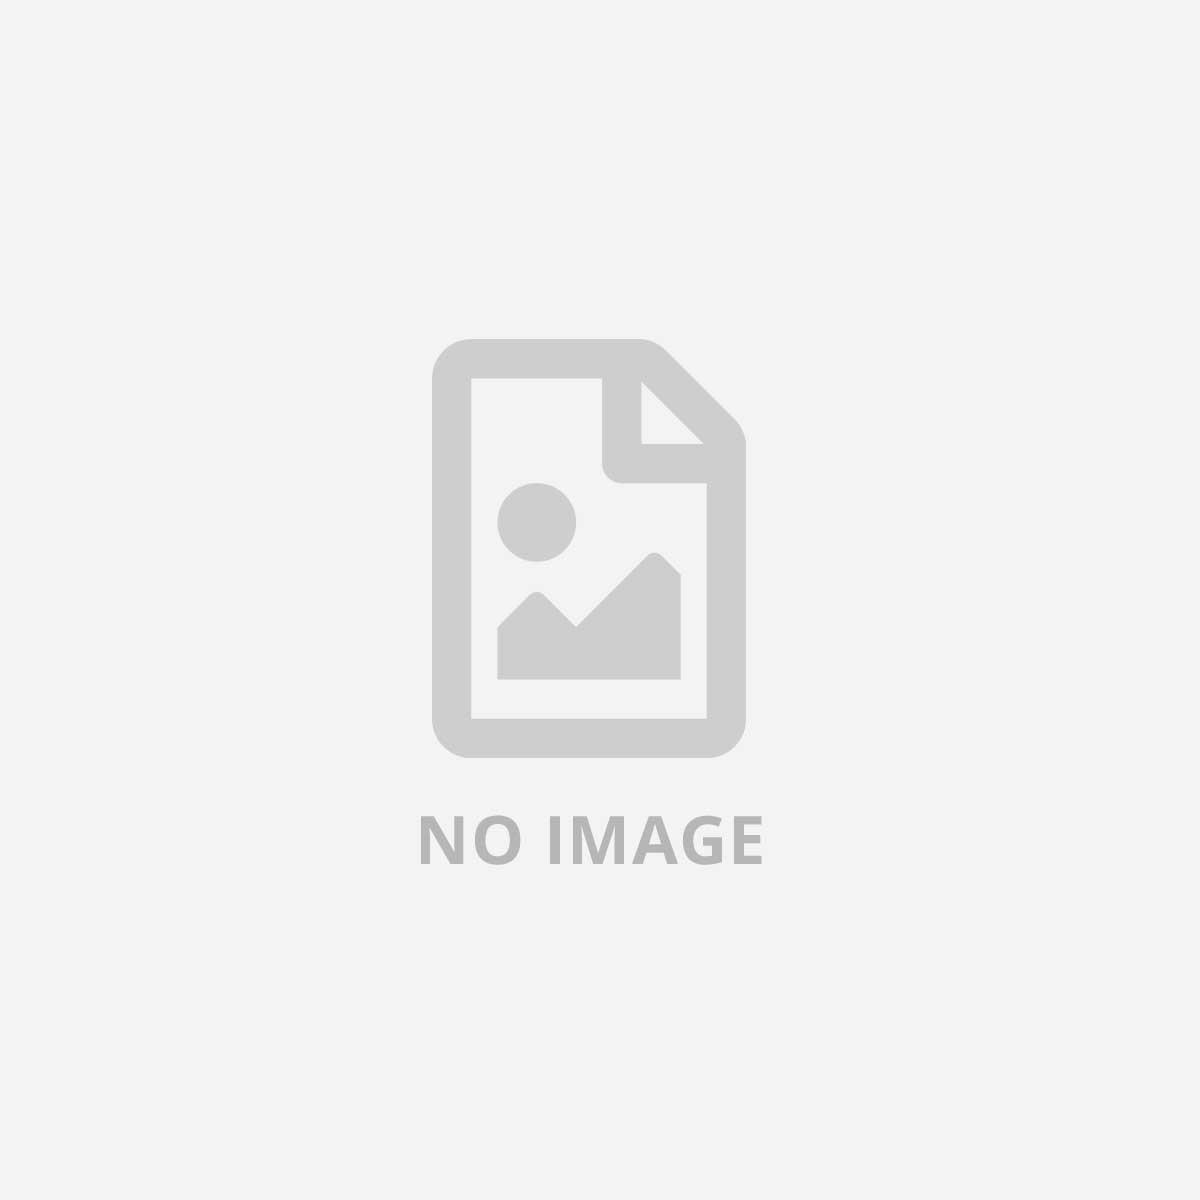 TELDAT BINTEC IP ACCESS ROUTER 11N WLAN DESKTOP